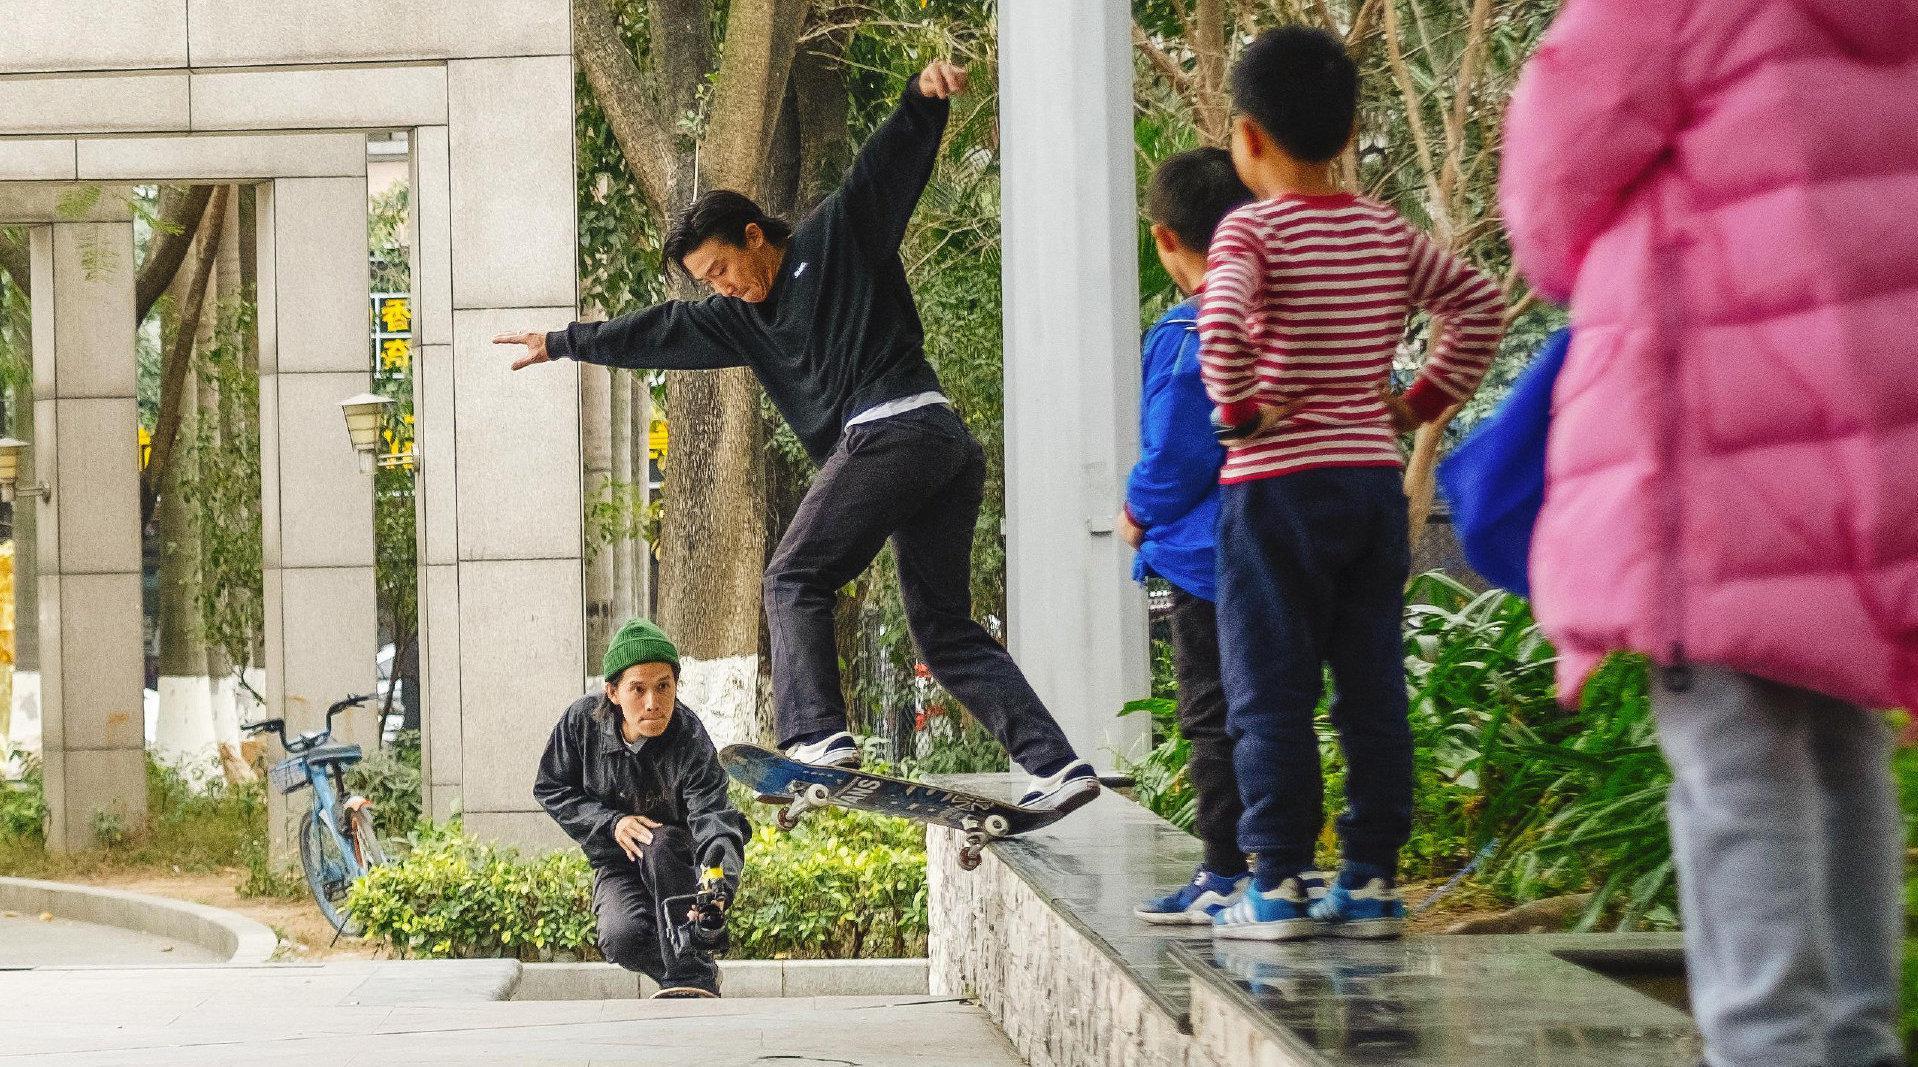 KTV - 深圳独立滑板影片「ITS OK」是由@Jay-Wuu 拍摄剪辑影片……